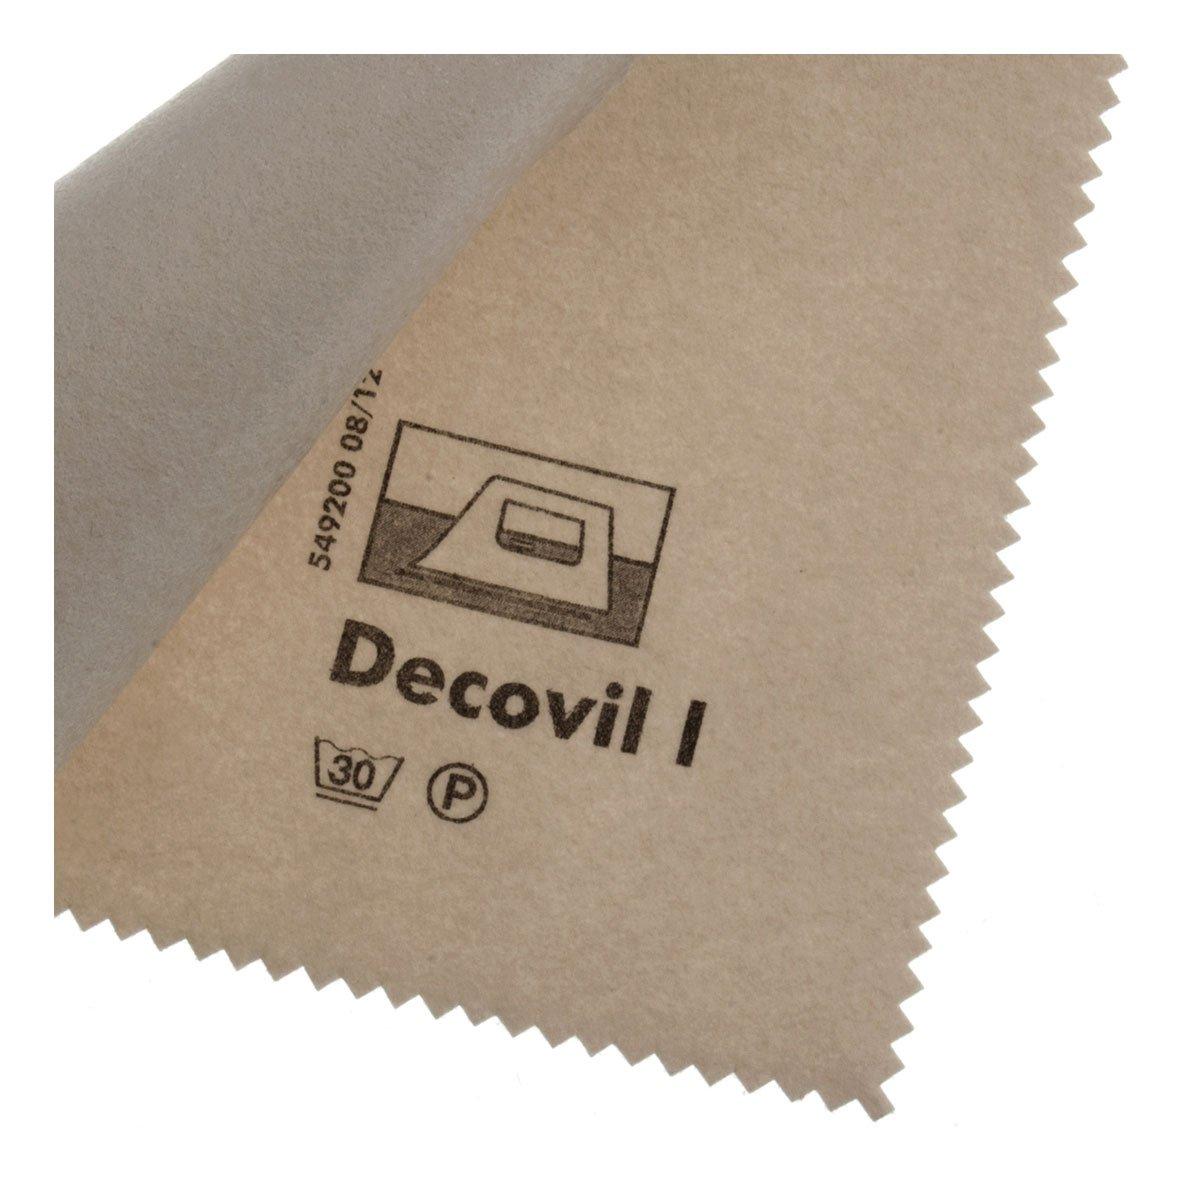 Vilene Decovil I interfacing-with a leather-like handle beige-coloured; width 35.10 inch/90cm, price per meter by Freudenberg/Vlieseline TOKO-Kurzwaren